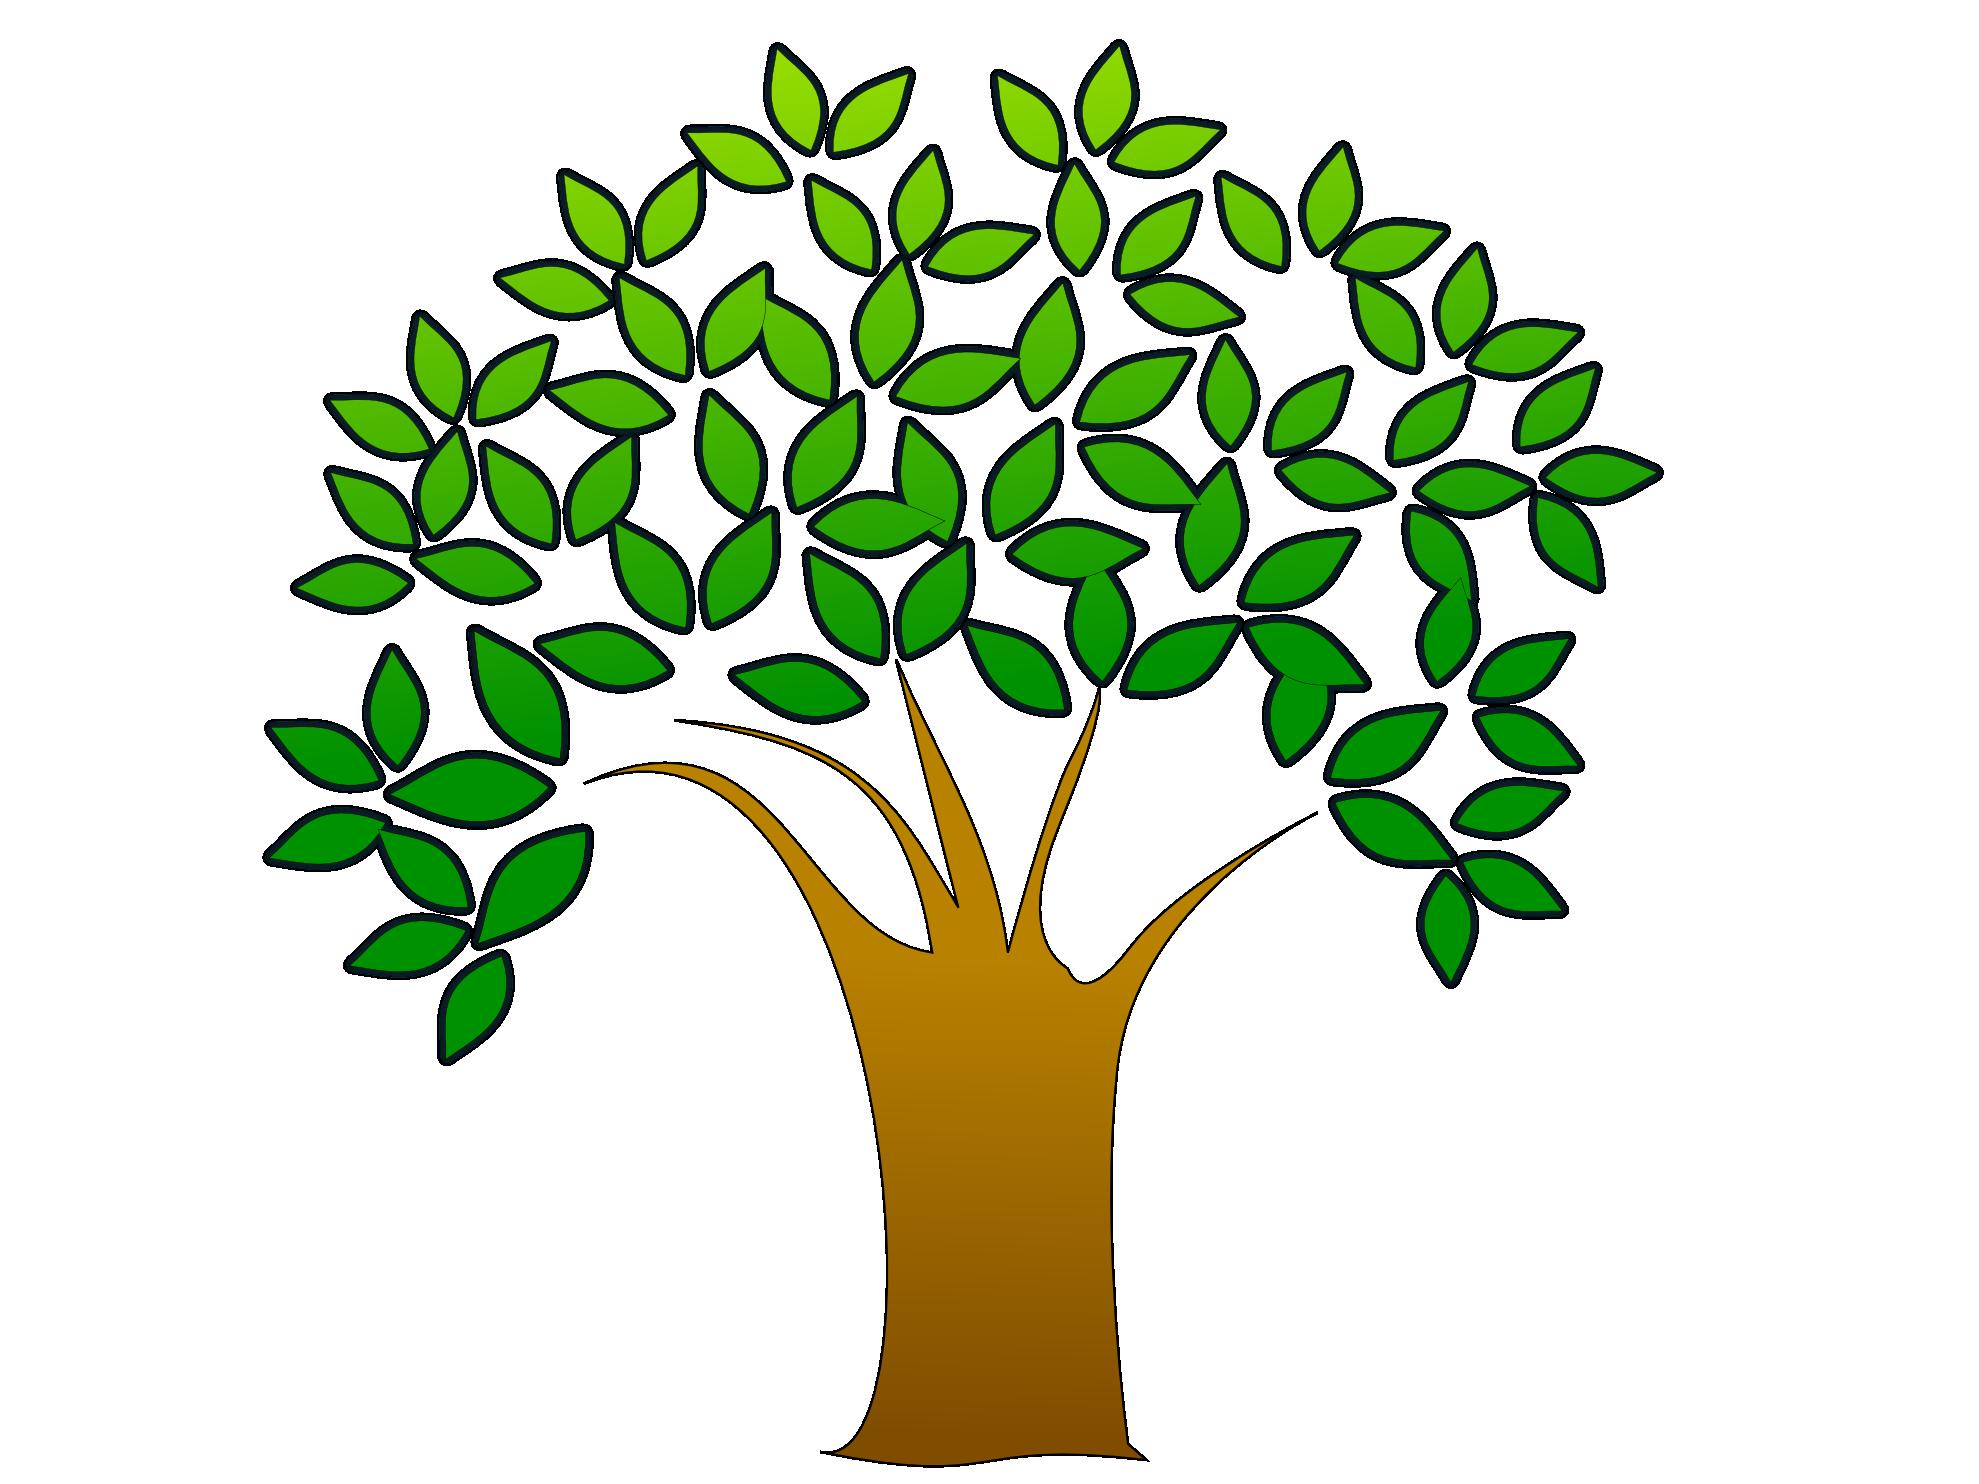 Oak tree tree clip art free clipart image clipart image